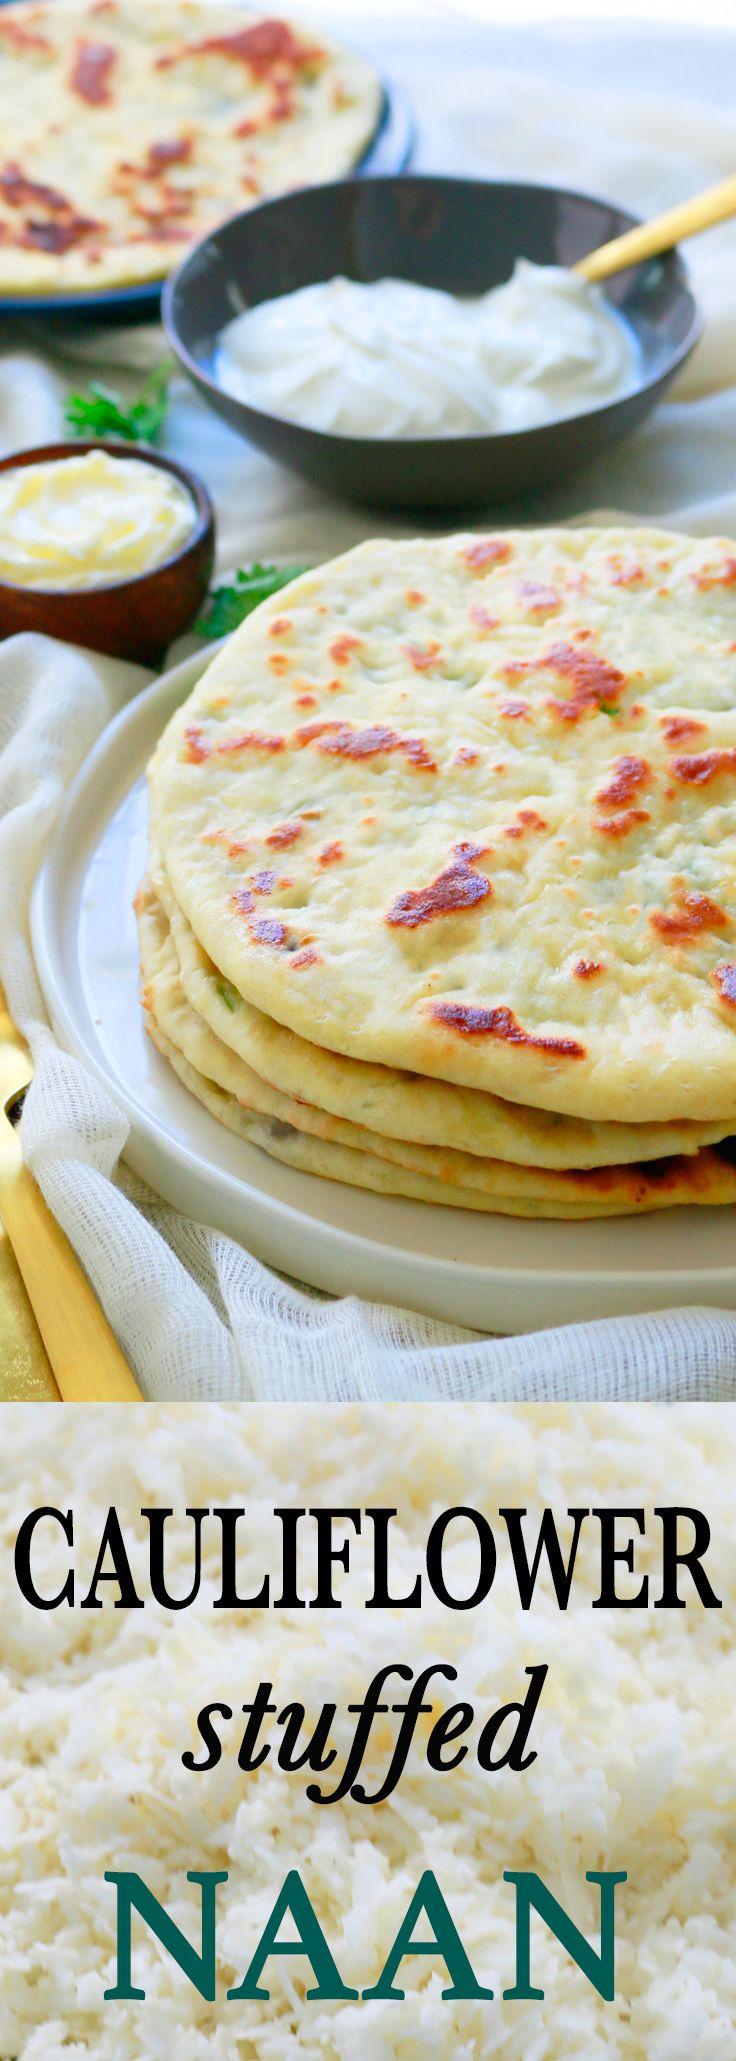 Cauliflower Stuffed Naan Food Recipes Food Indian Food Recipes